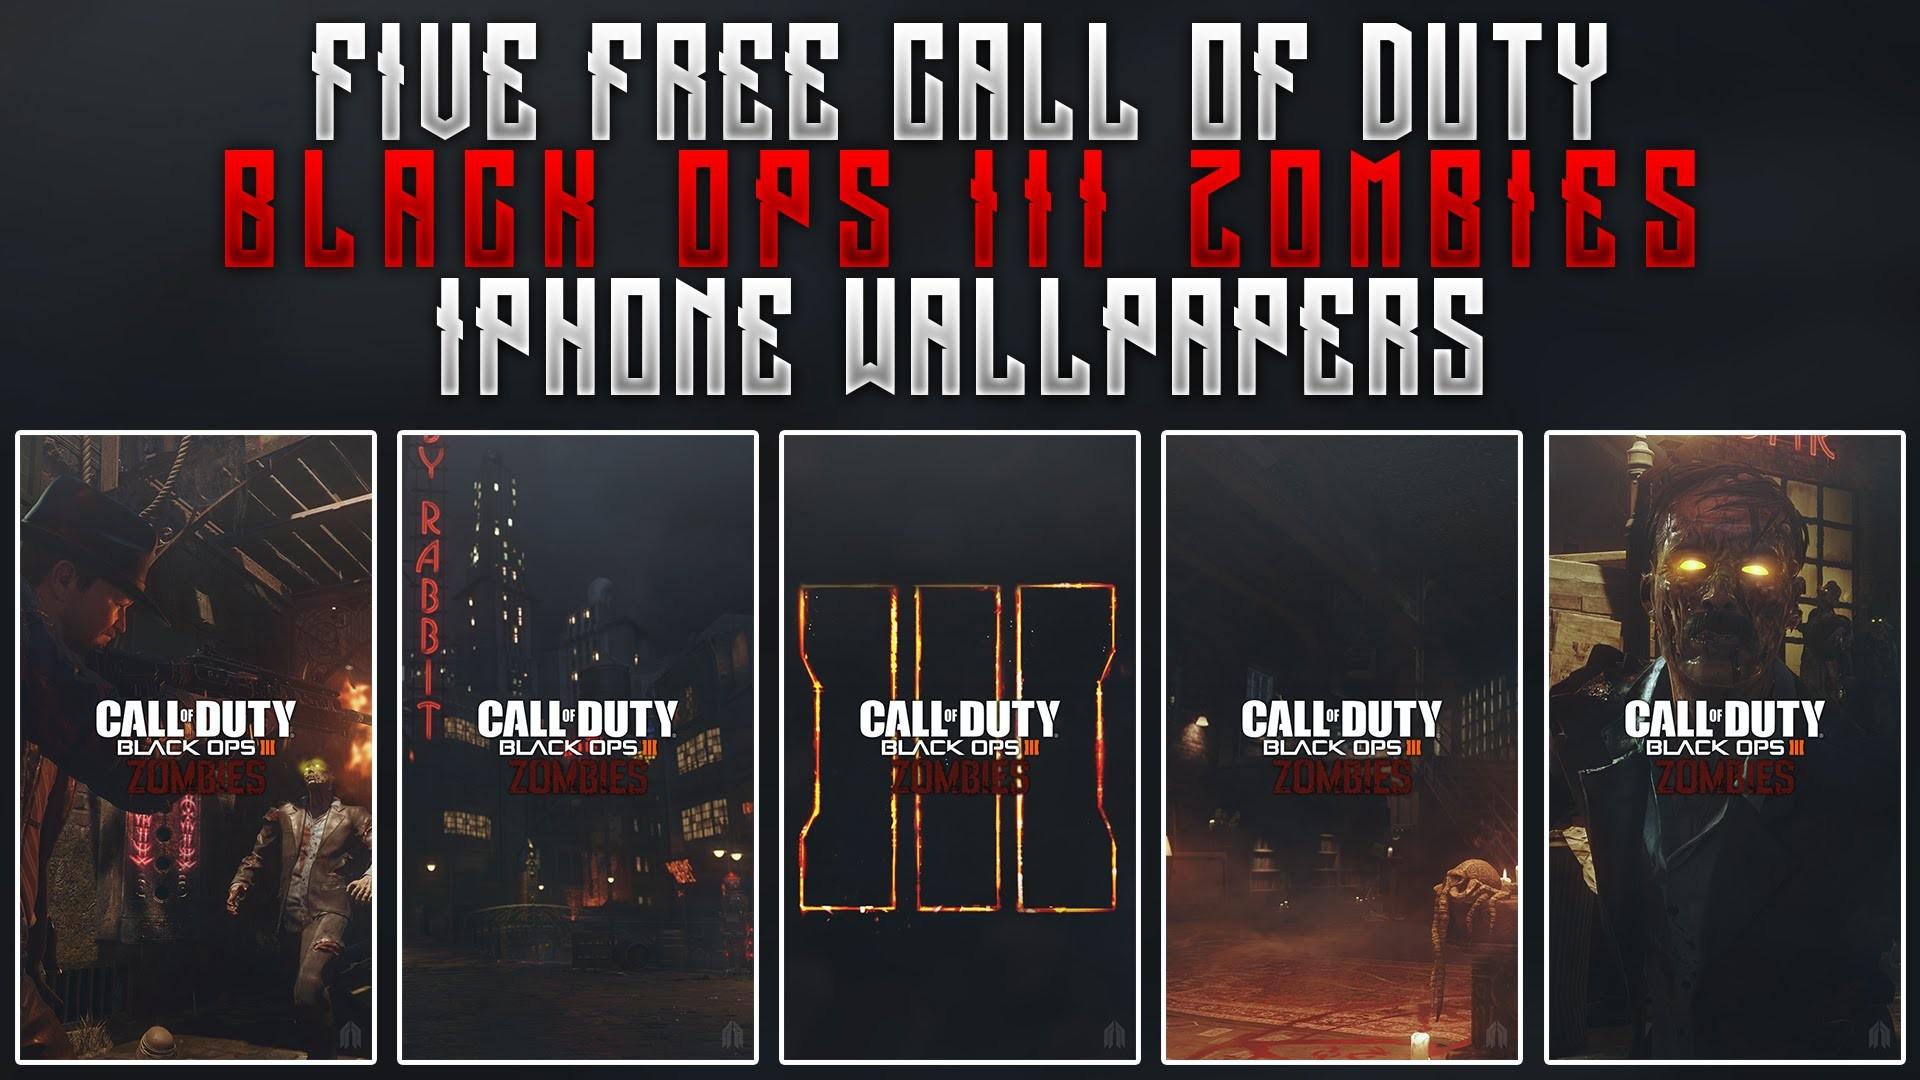 GFX Black Ops III Zombie iPhone Wallpaper Designs Free Wallpaper Pack –  YouTube